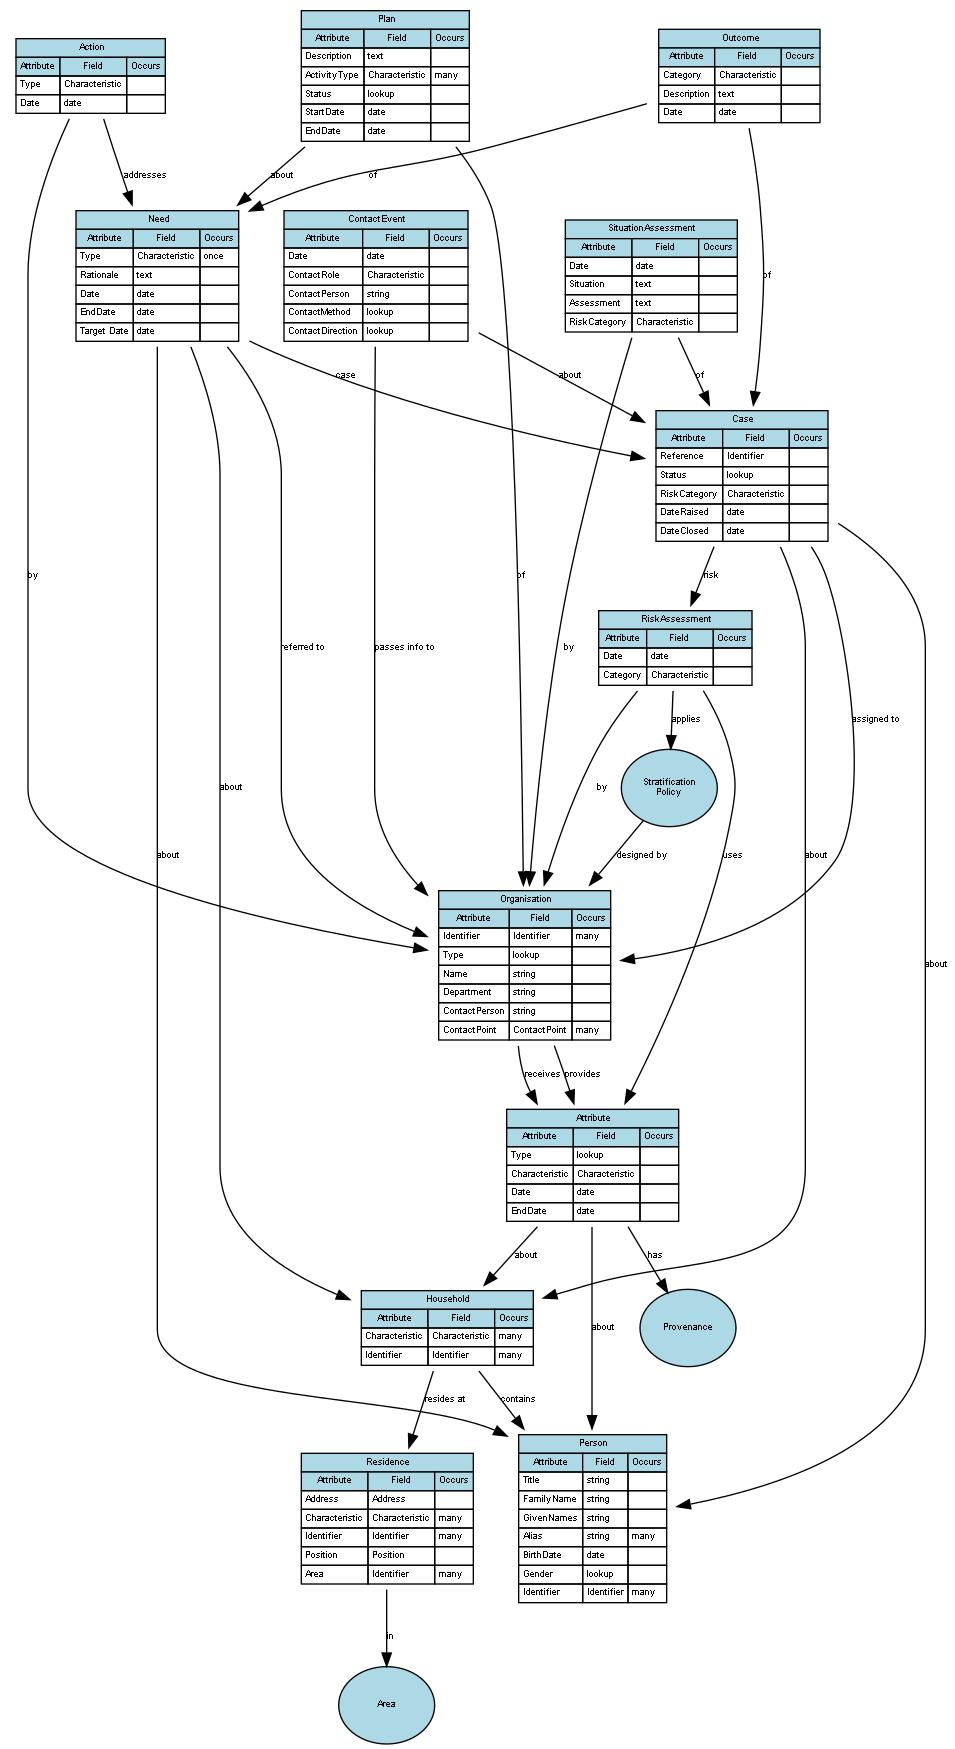 EntireEntityModel.gv (2).png